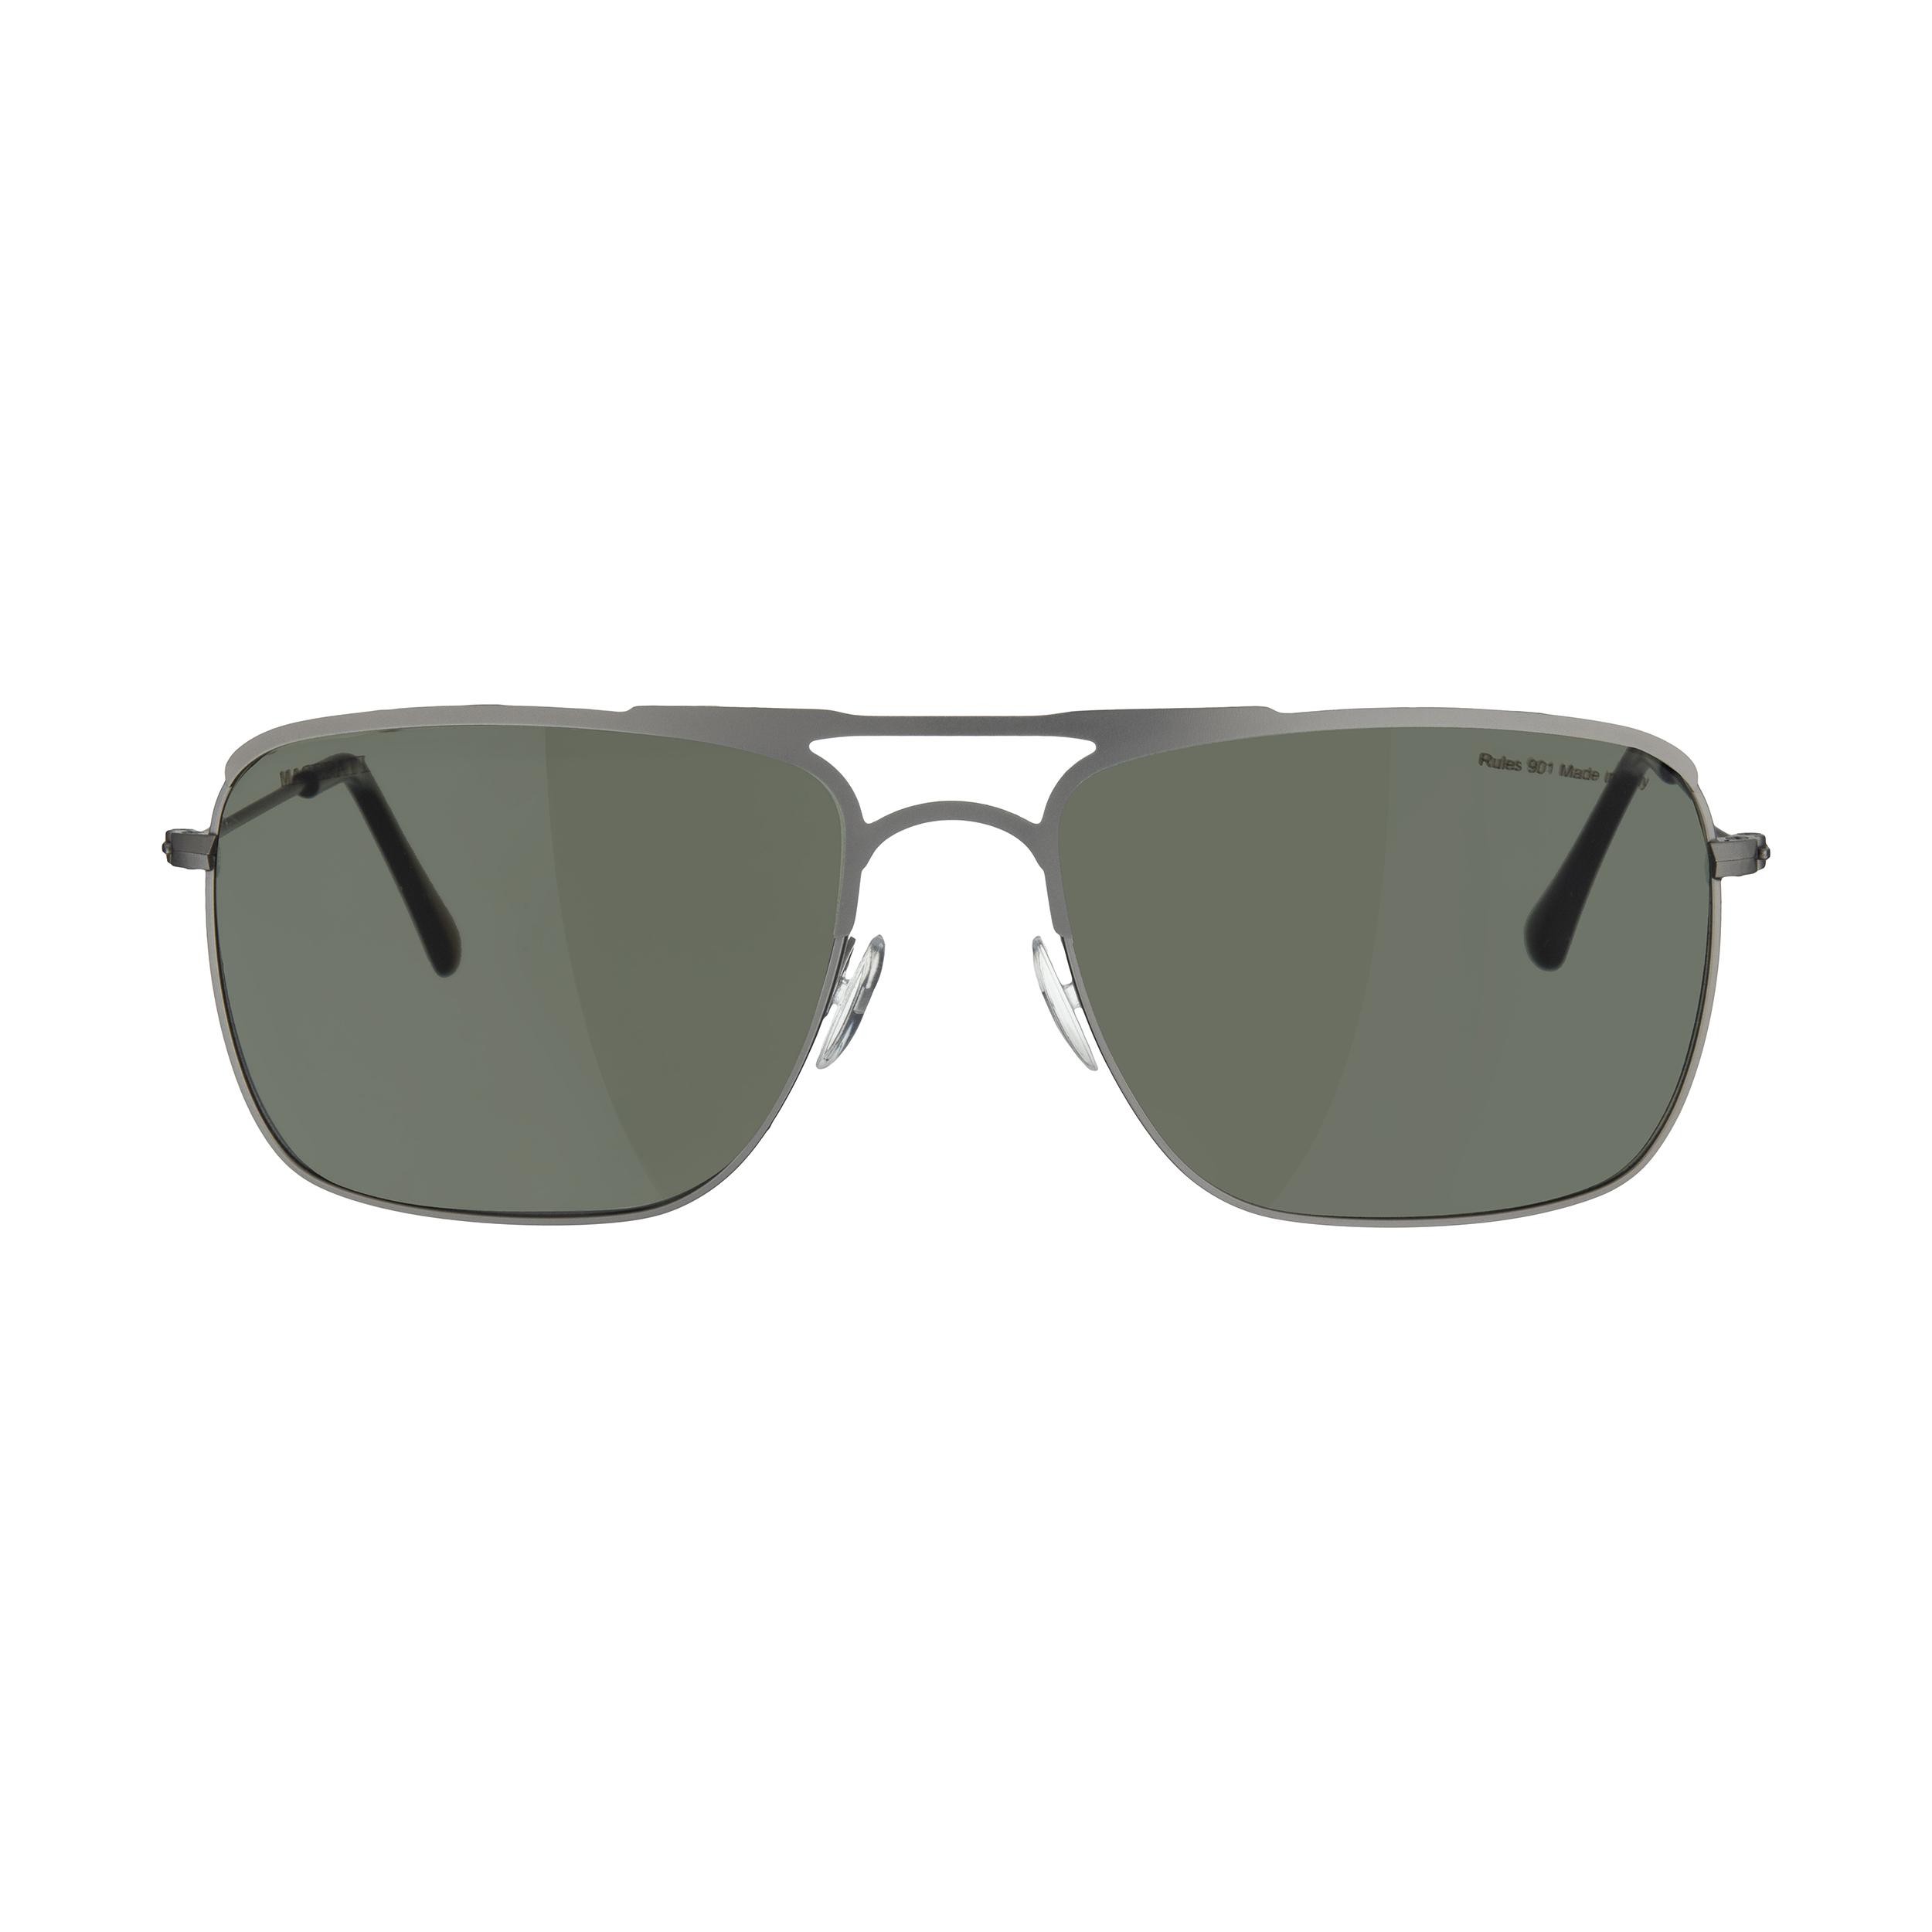 عینک آفتابی مردانه مدل Rules-901-G